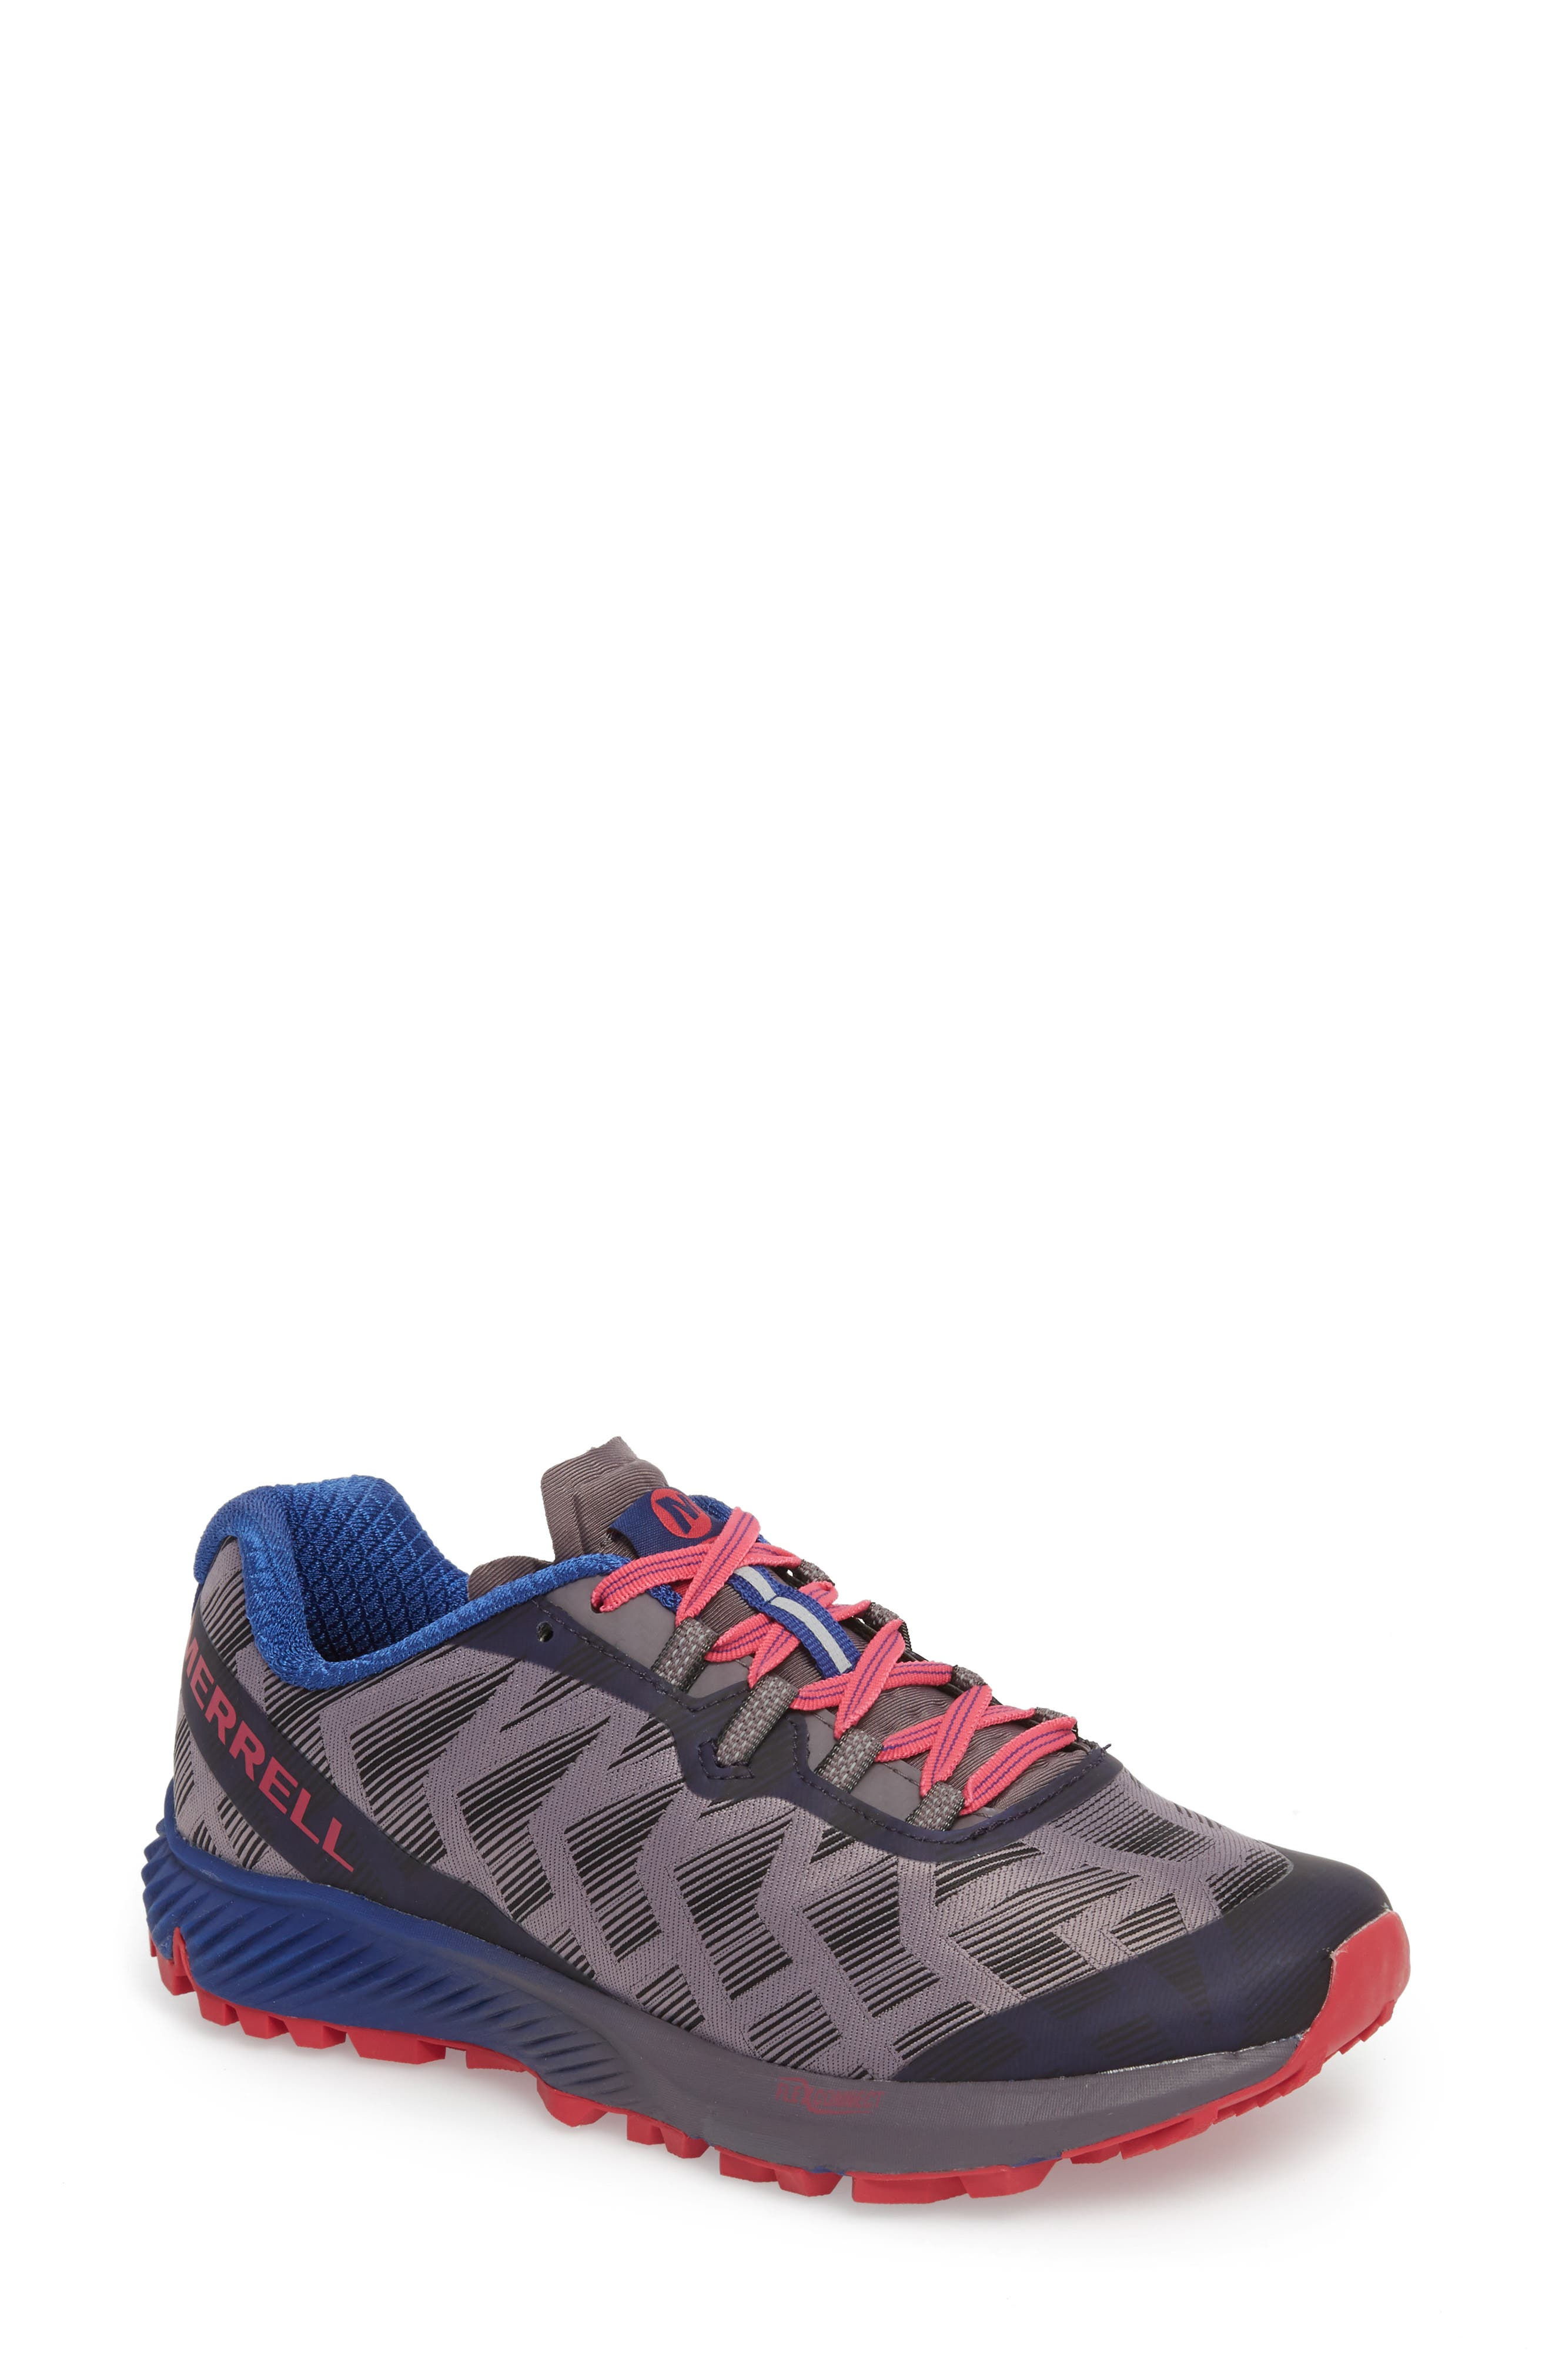 Agility Synthesis Flex Sneaker,                             Main thumbnail 1, color,                             SHARK FABRIC